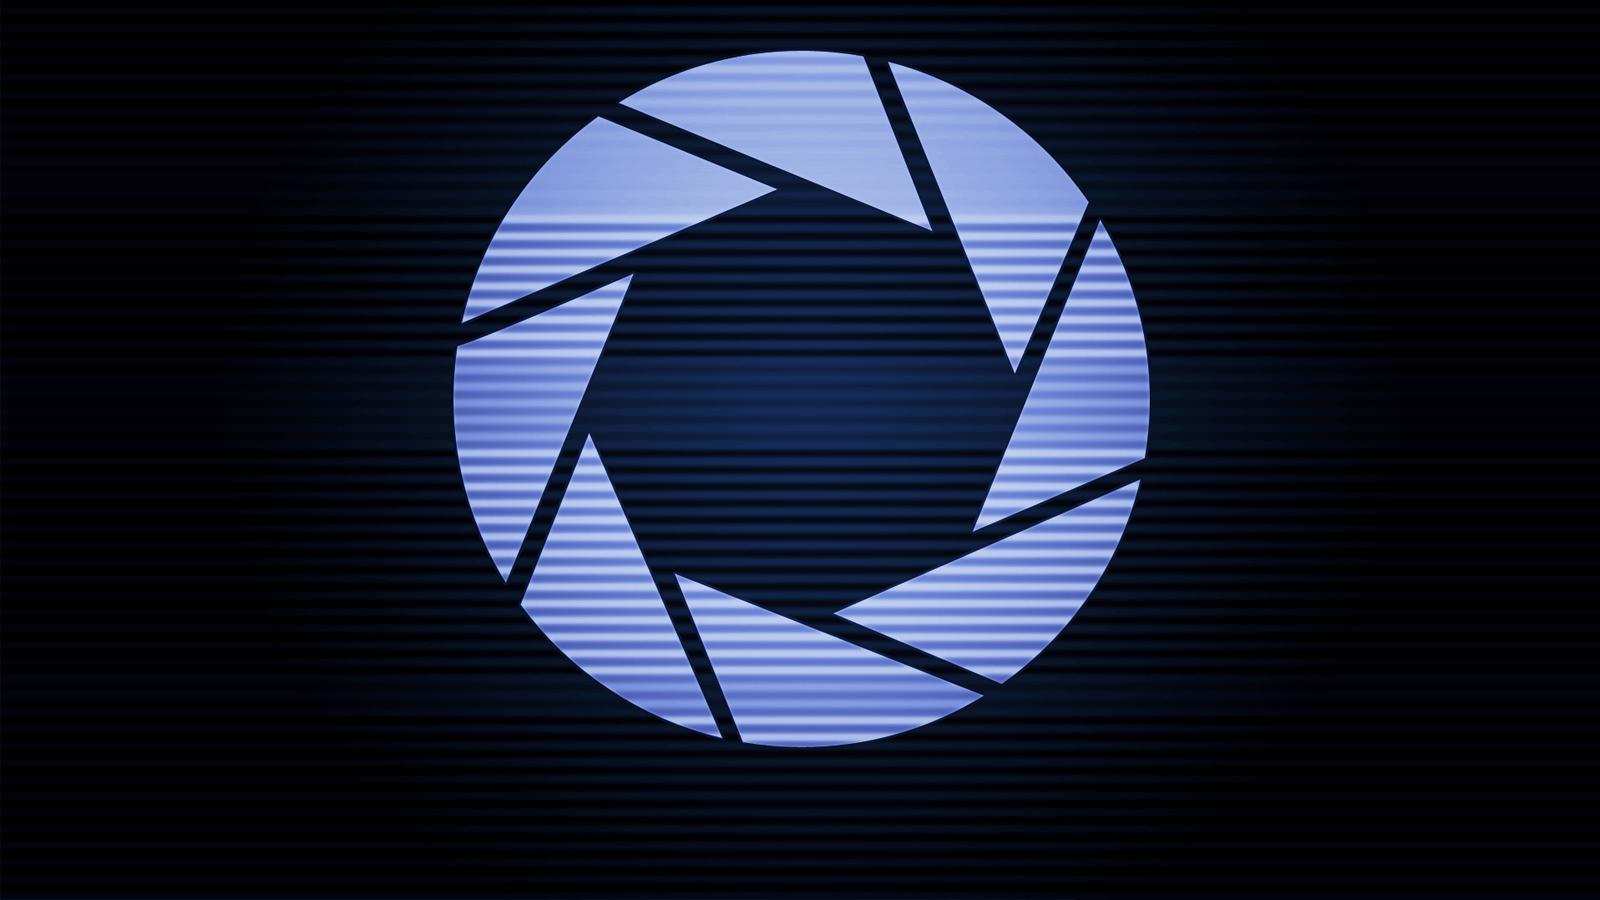 portal aperture laboratories HD Wallpaper   Games 1106744 1600x900